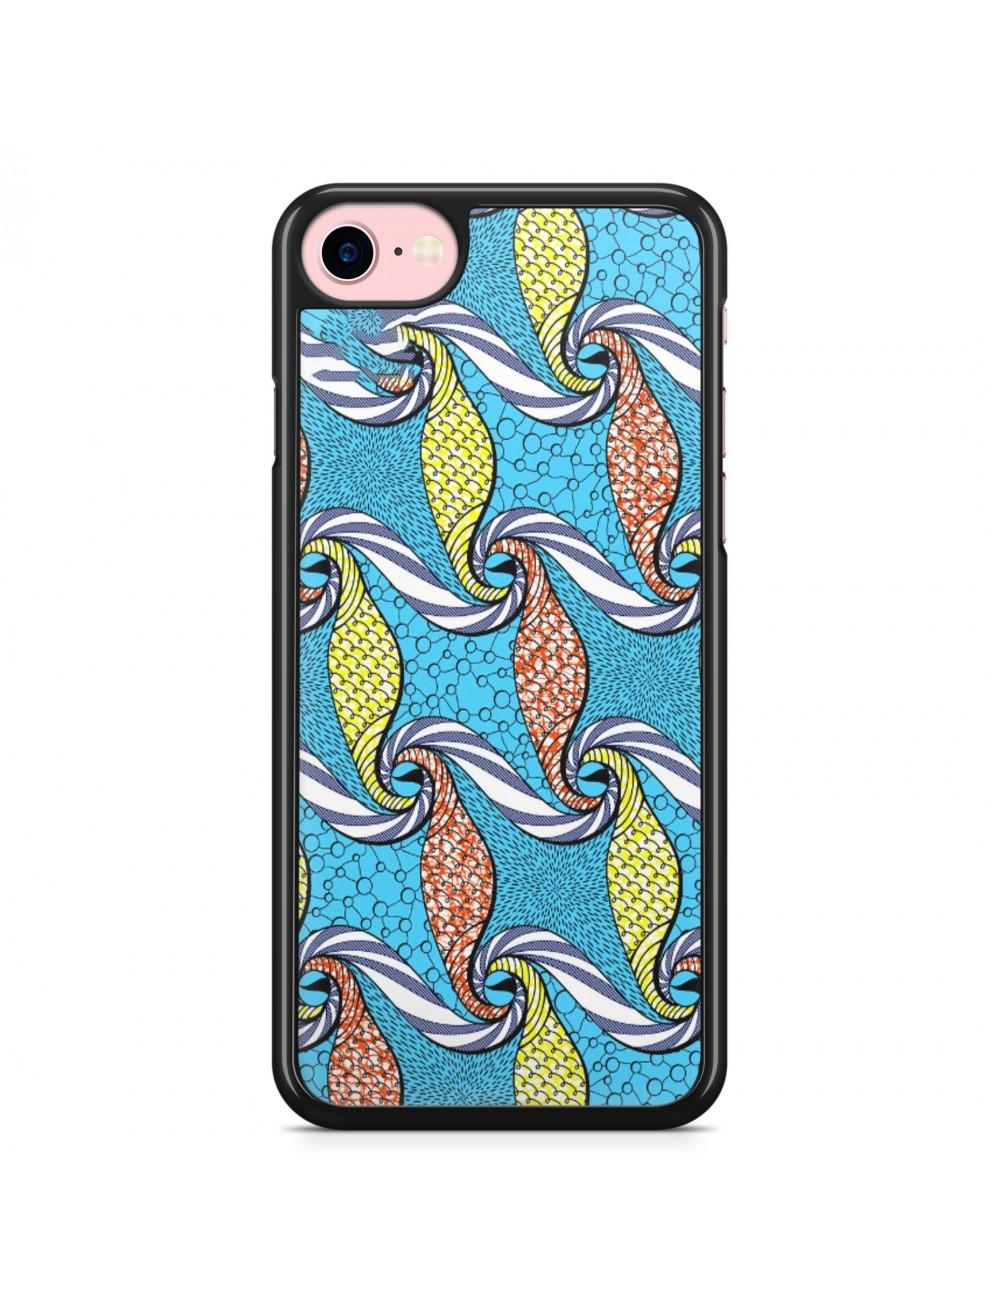 Coque pour iPhone Liberty Mitsi Jacinthe